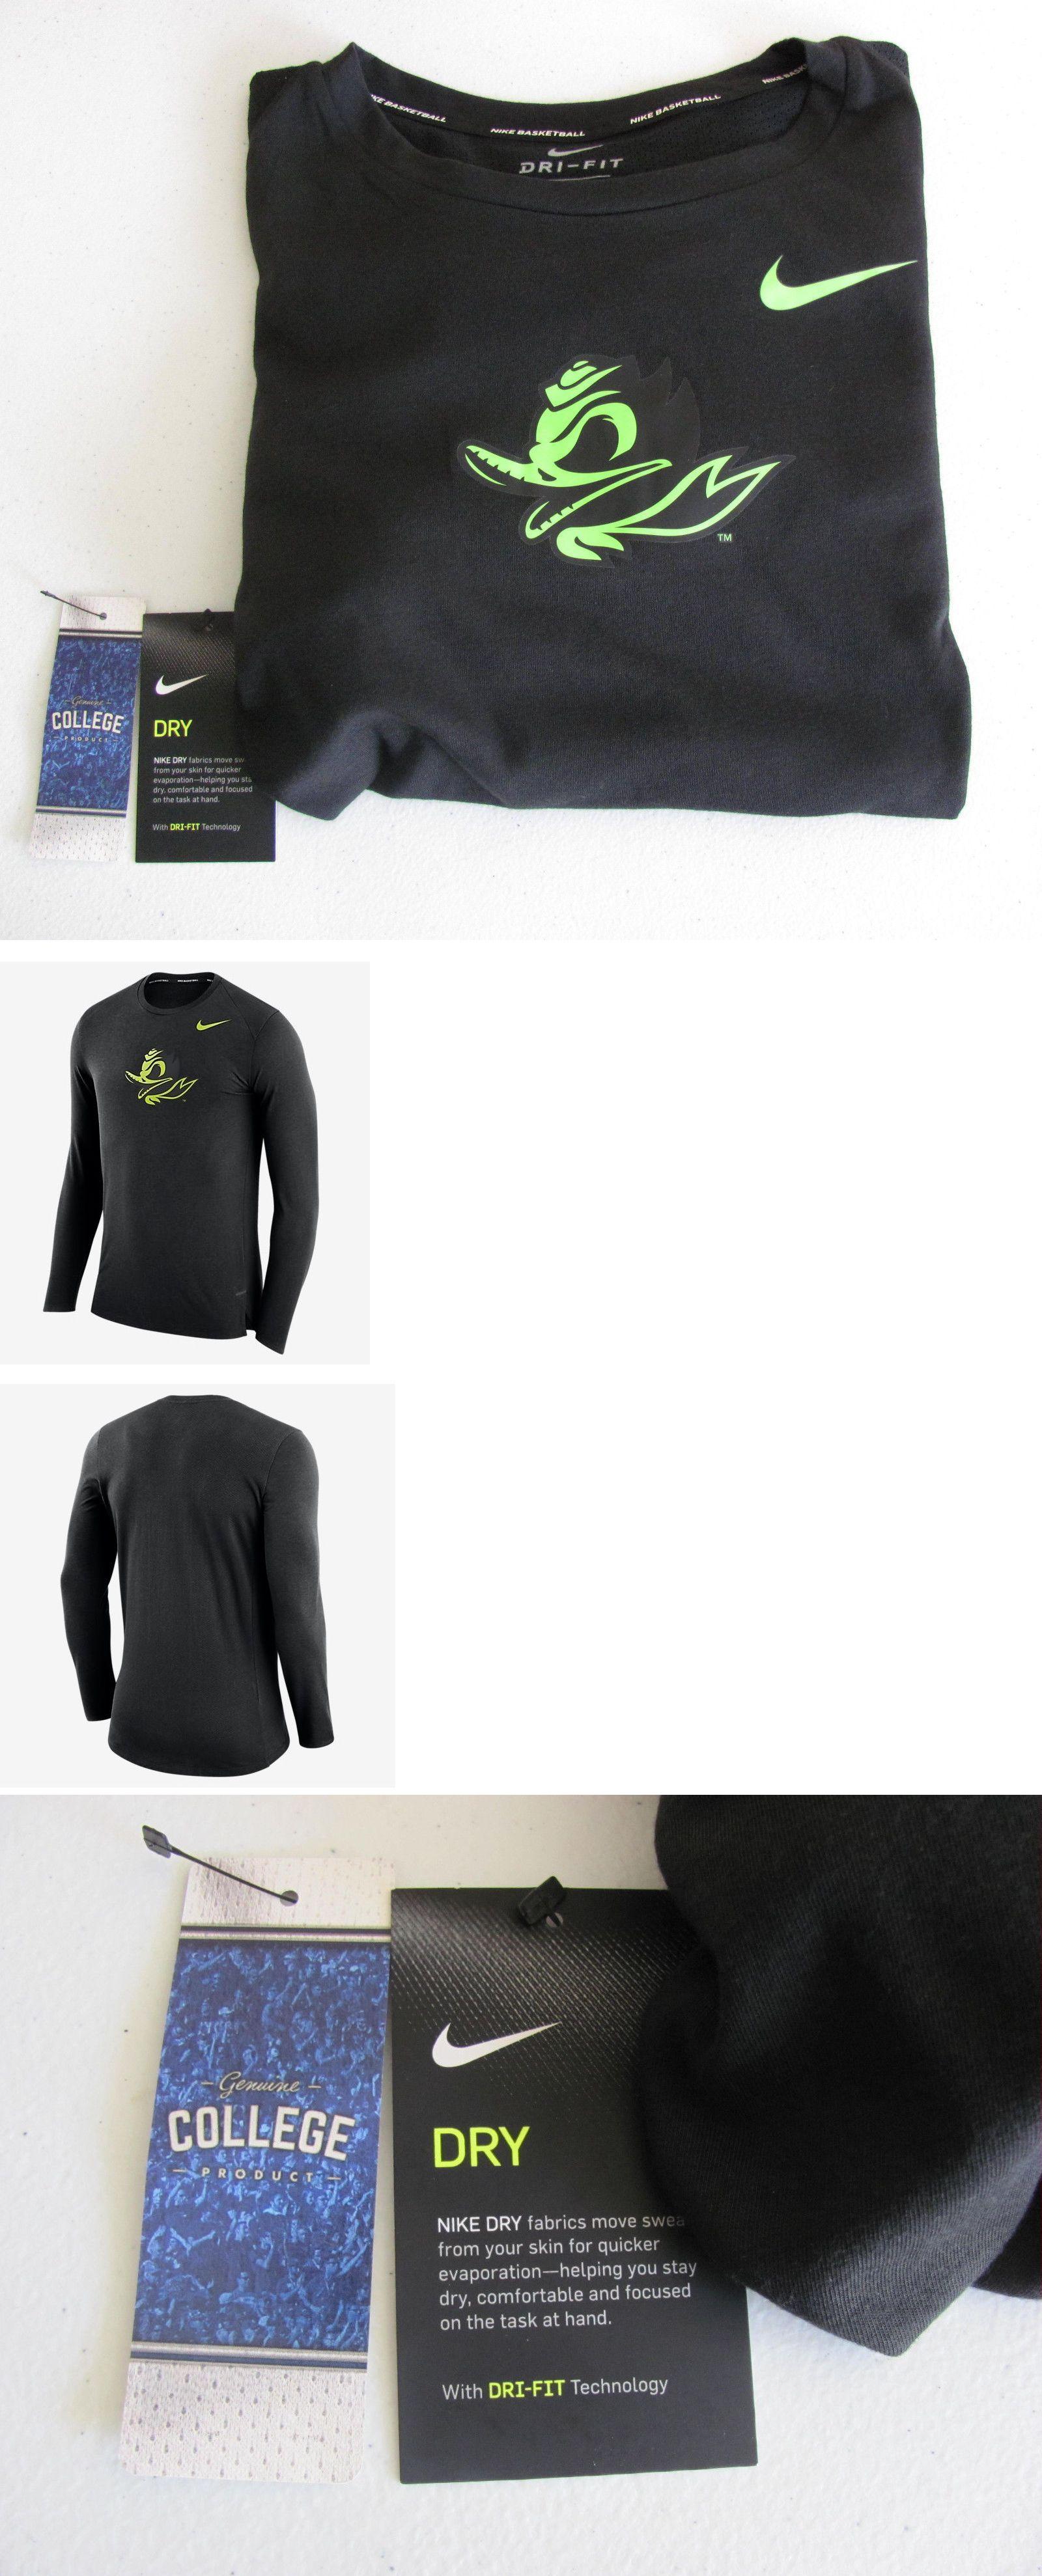 d9517a483722 Athletic Apparel 137084  Men S Nike Oregon Ducks Dri Fit Basketball Long  Sleeve Shirt Nwt  60 Xl-2Xl -  BUY IT NOW ONLY   31.99 on eBay!